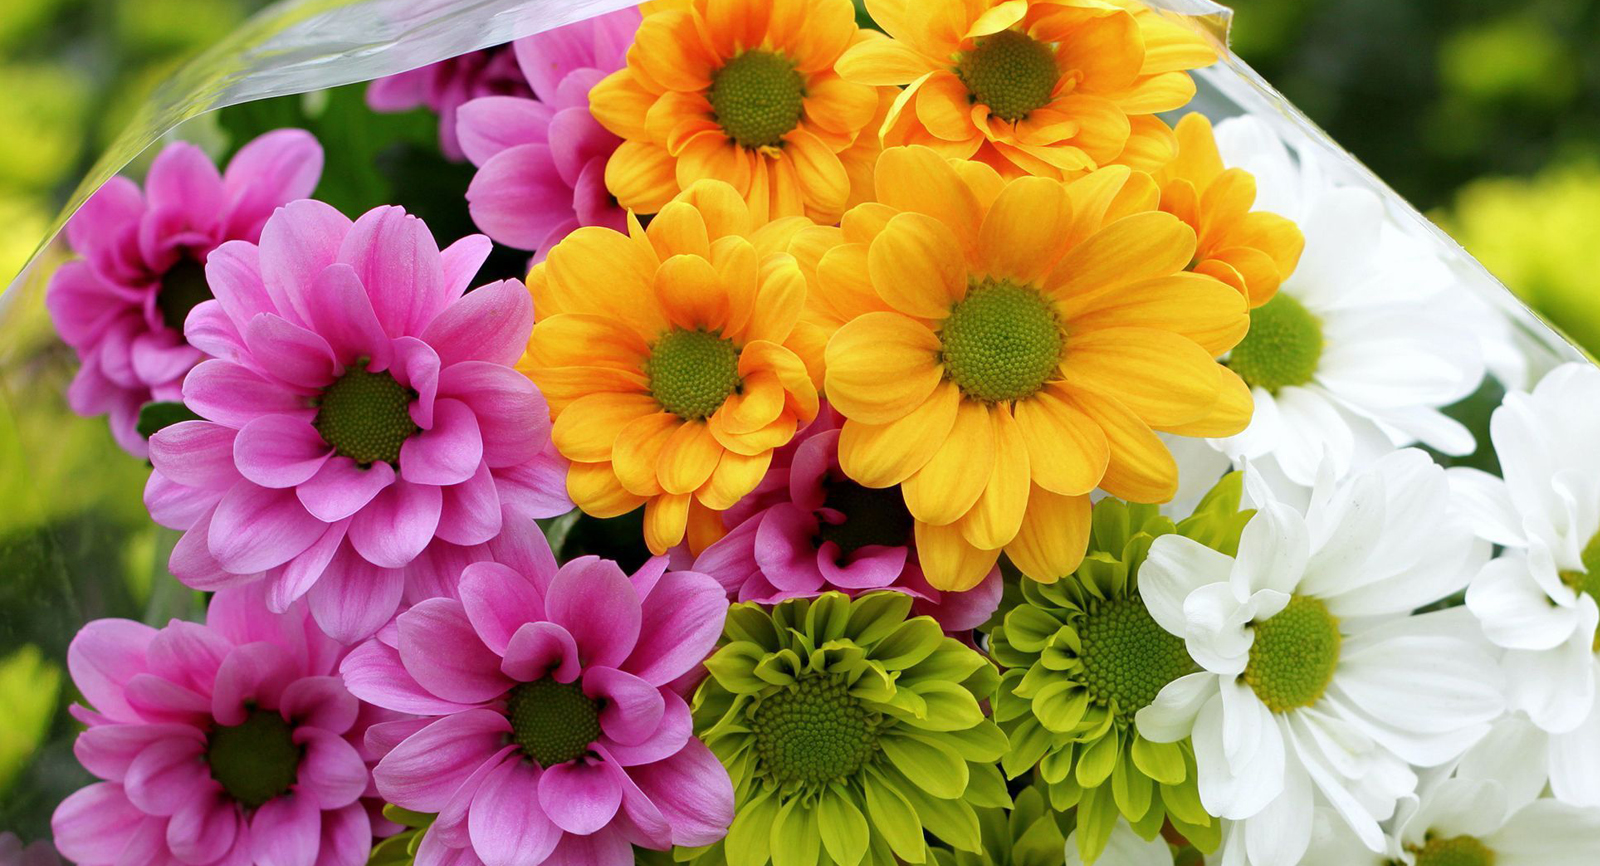 Memilih Jenis Bunga